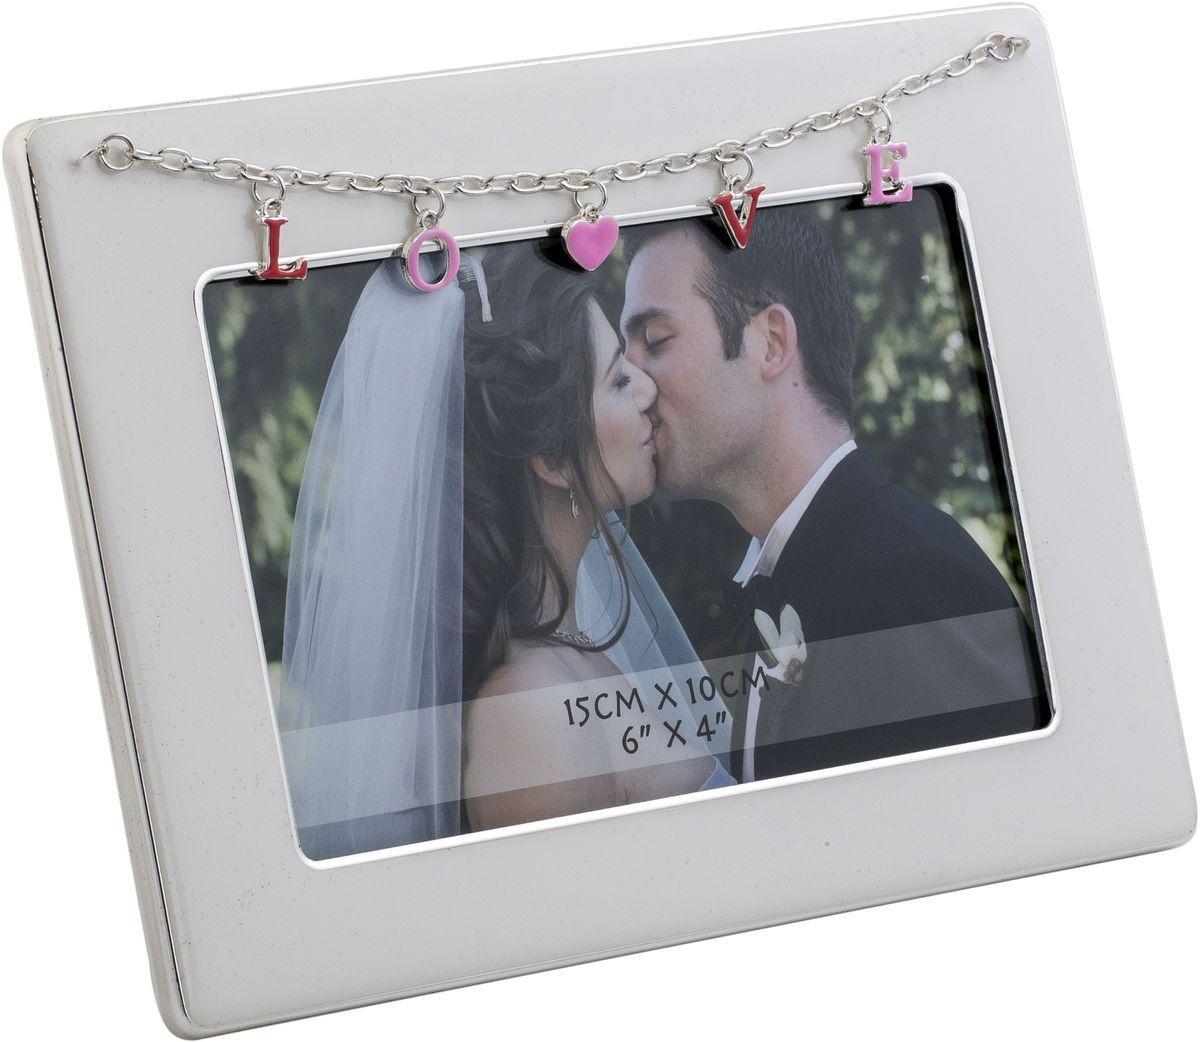 Фоторамка декоративная Platinum Love, 10 х 15 см. PF11301R-4PLATINUM PF11301R-4